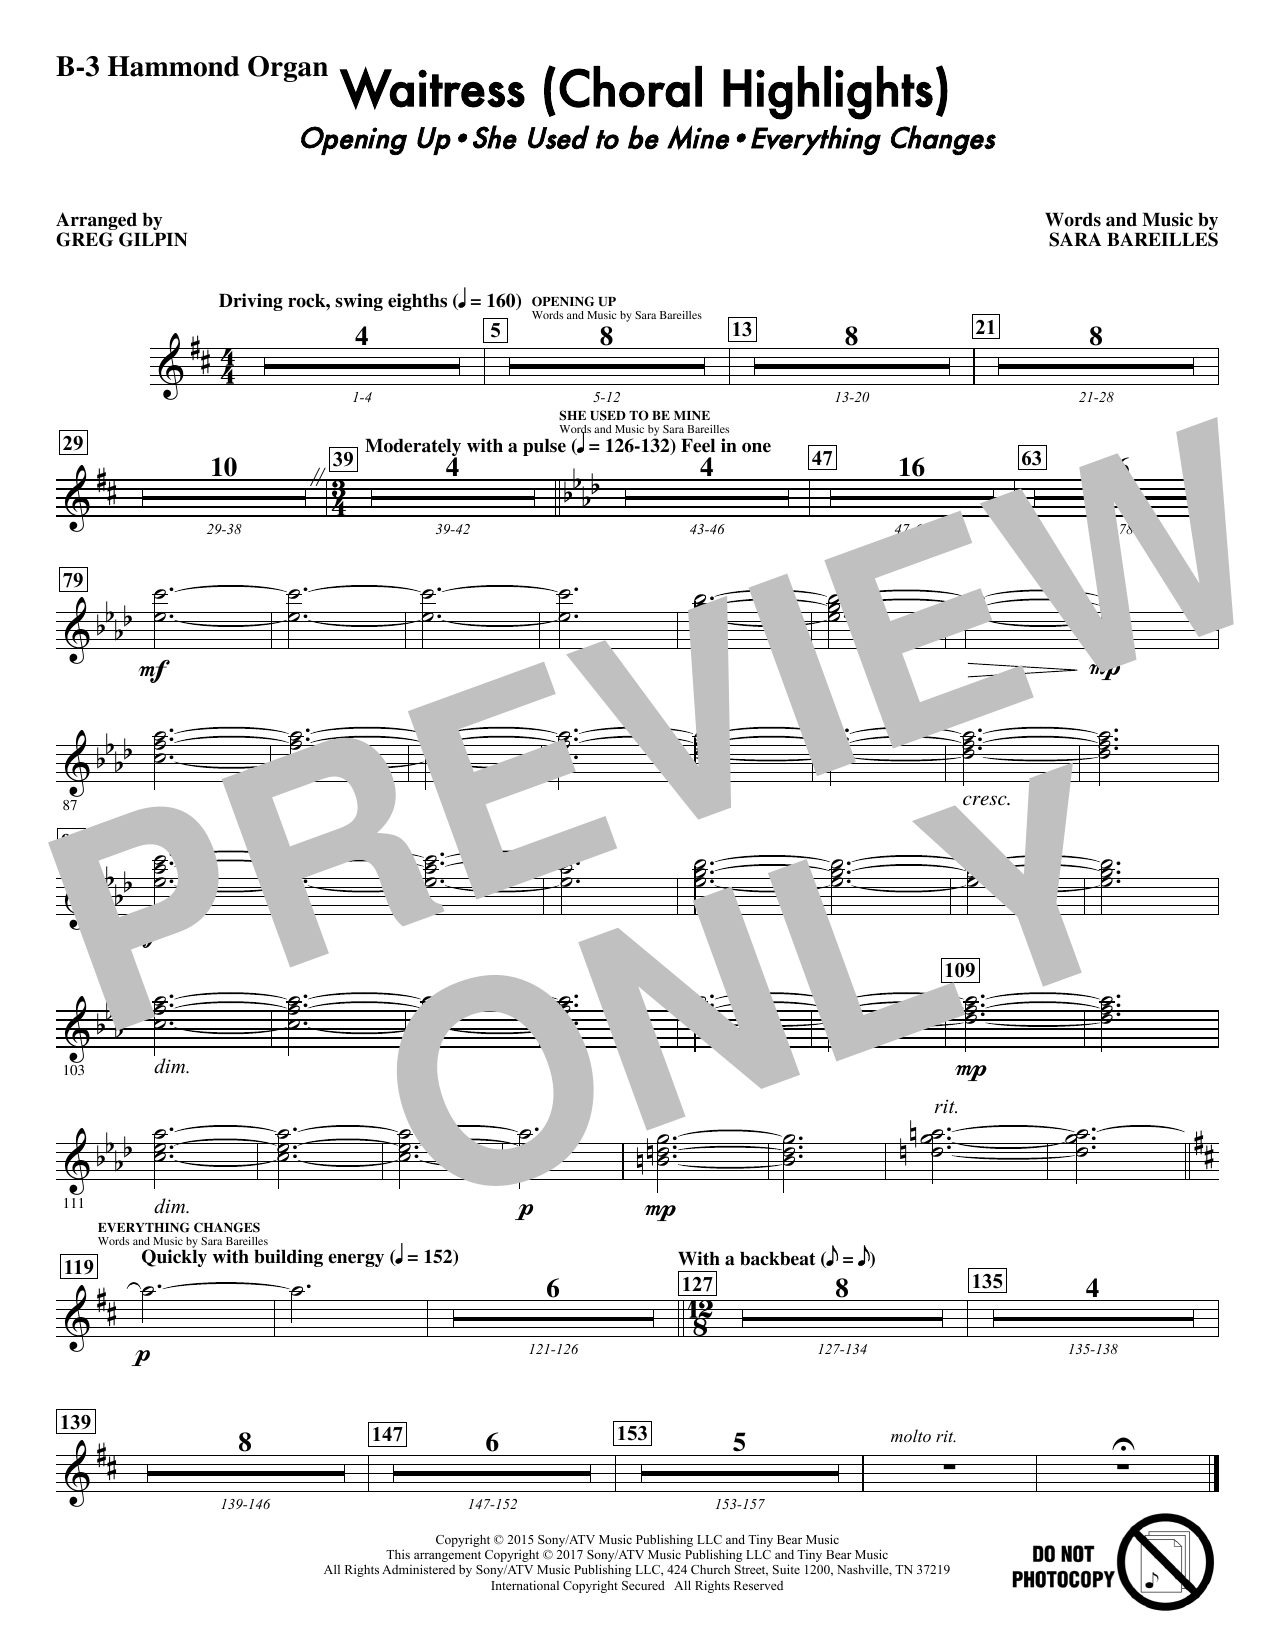 Waitress (Choral Highlights) - Hammond Organ Sheet Music